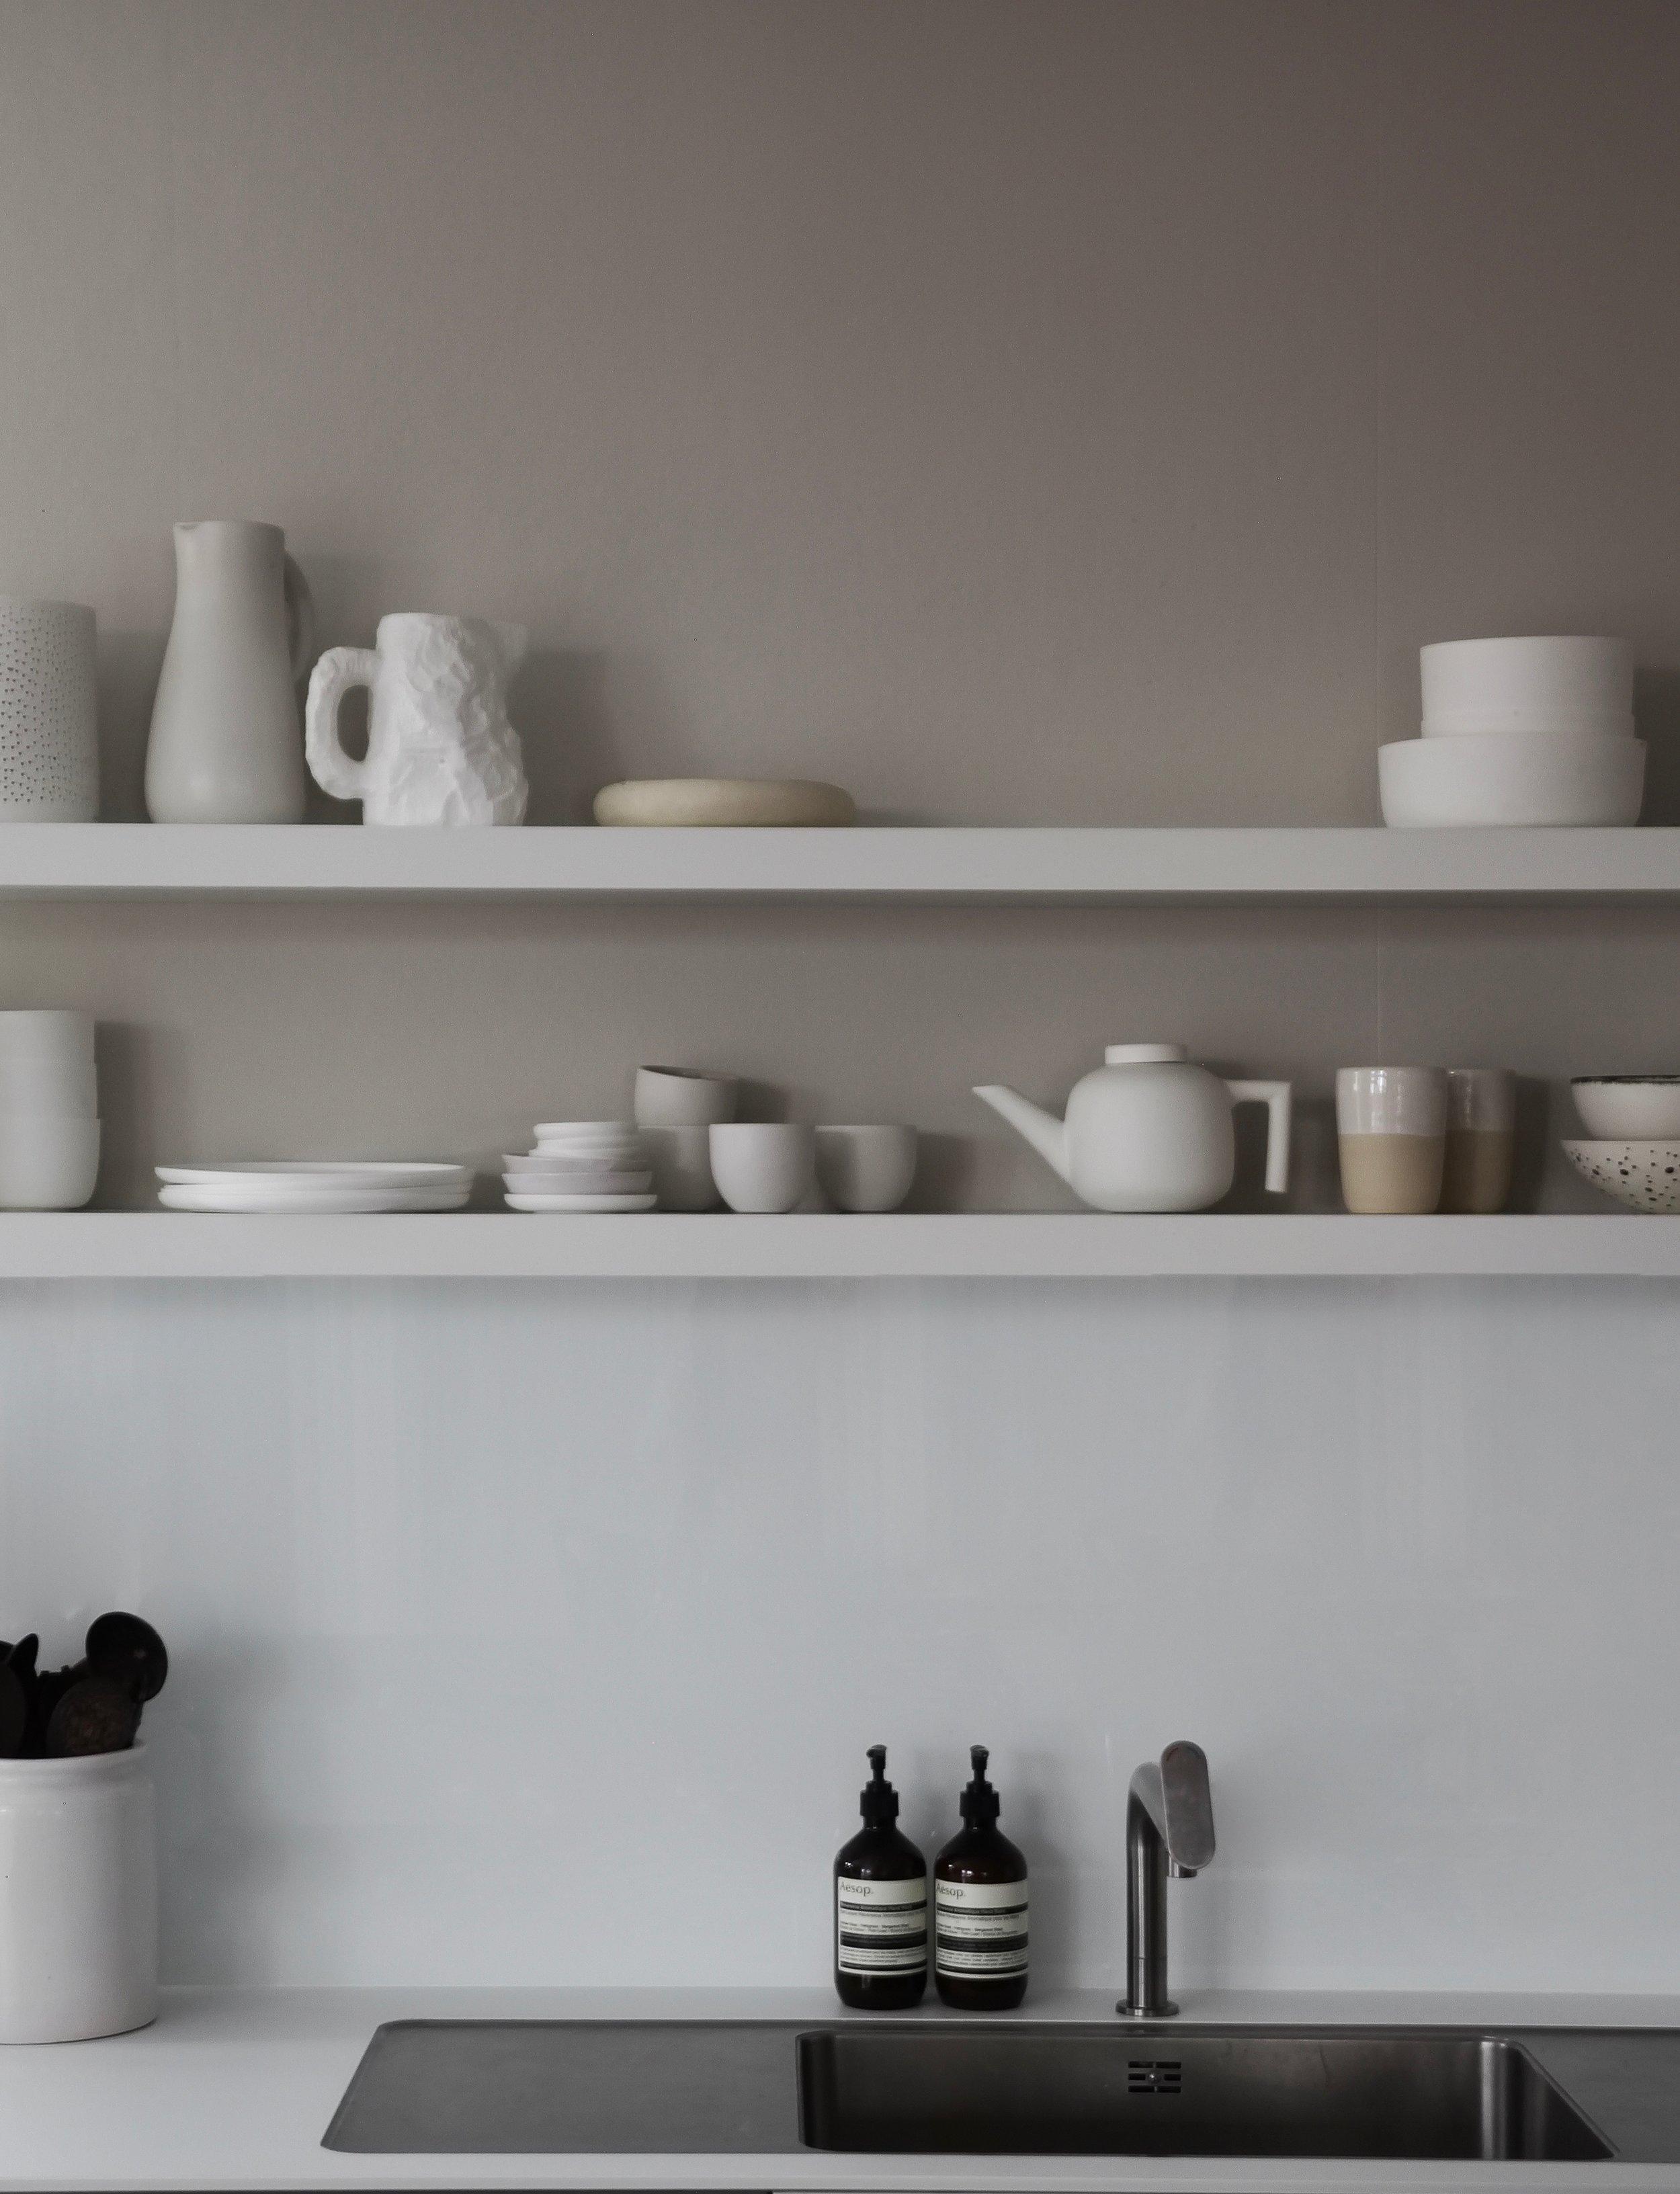 Kitchendesign my home, photo by Elisabeth Heier